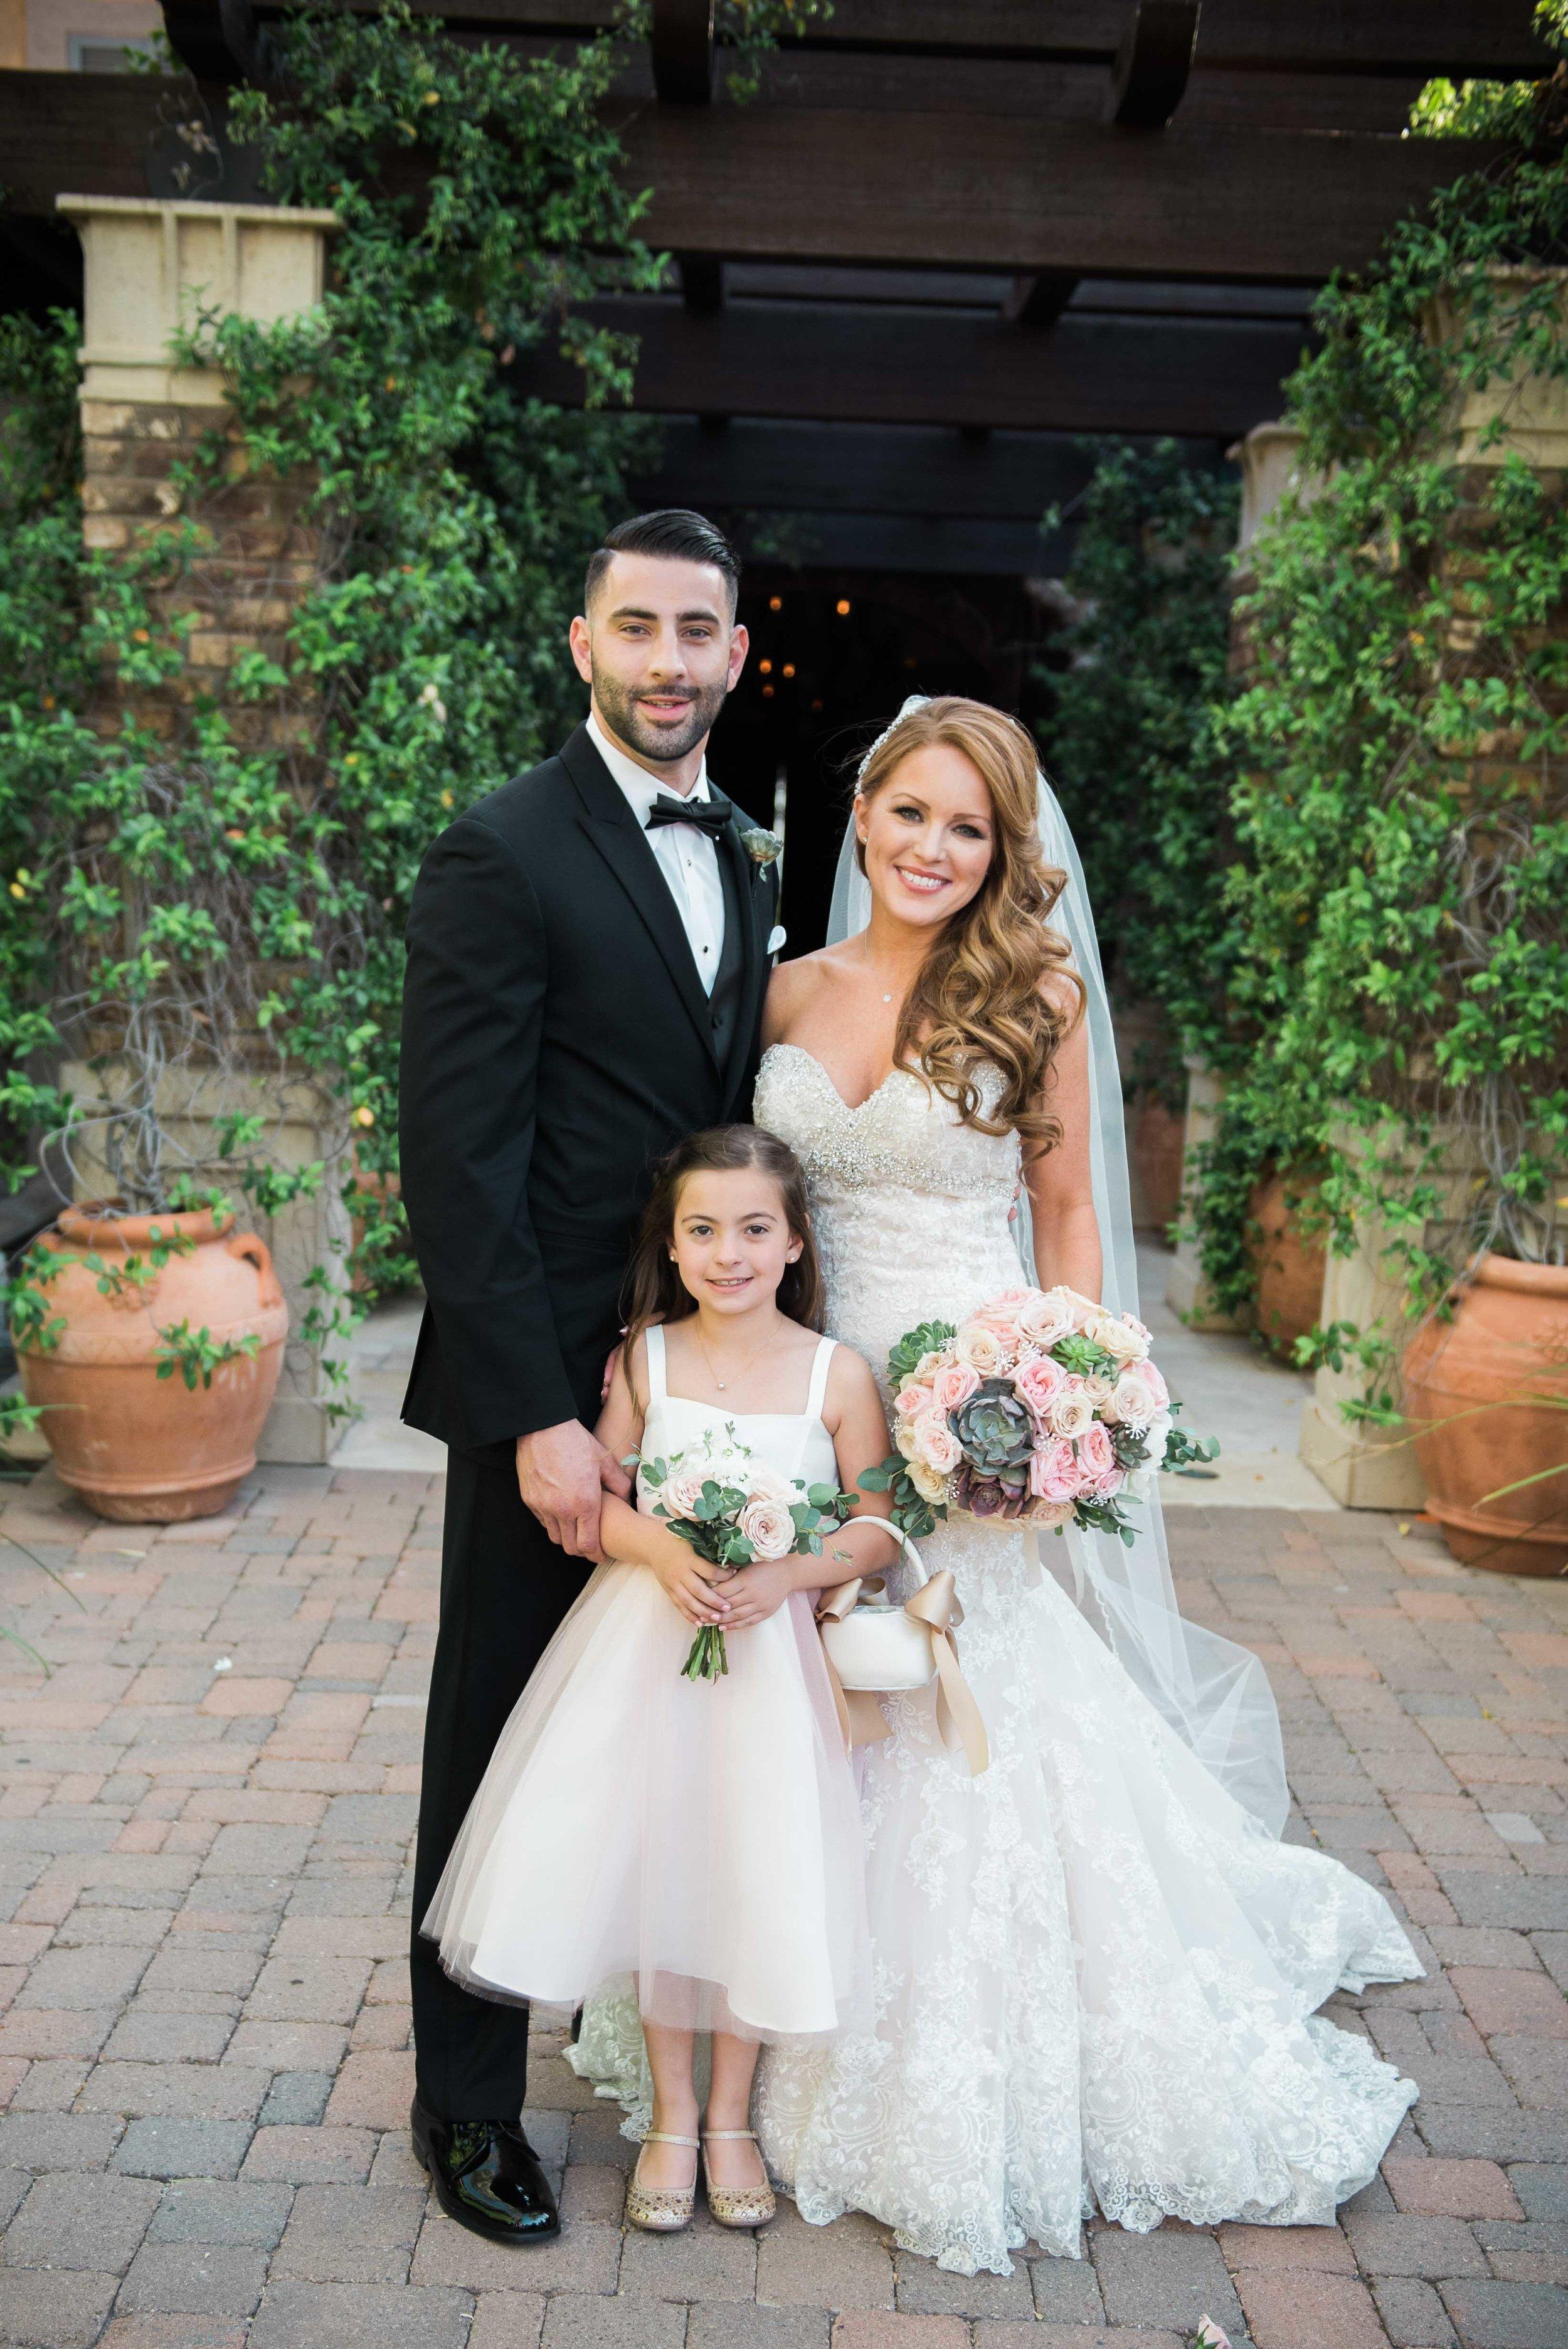 weddingwebsitesmallerpics-168.jpg